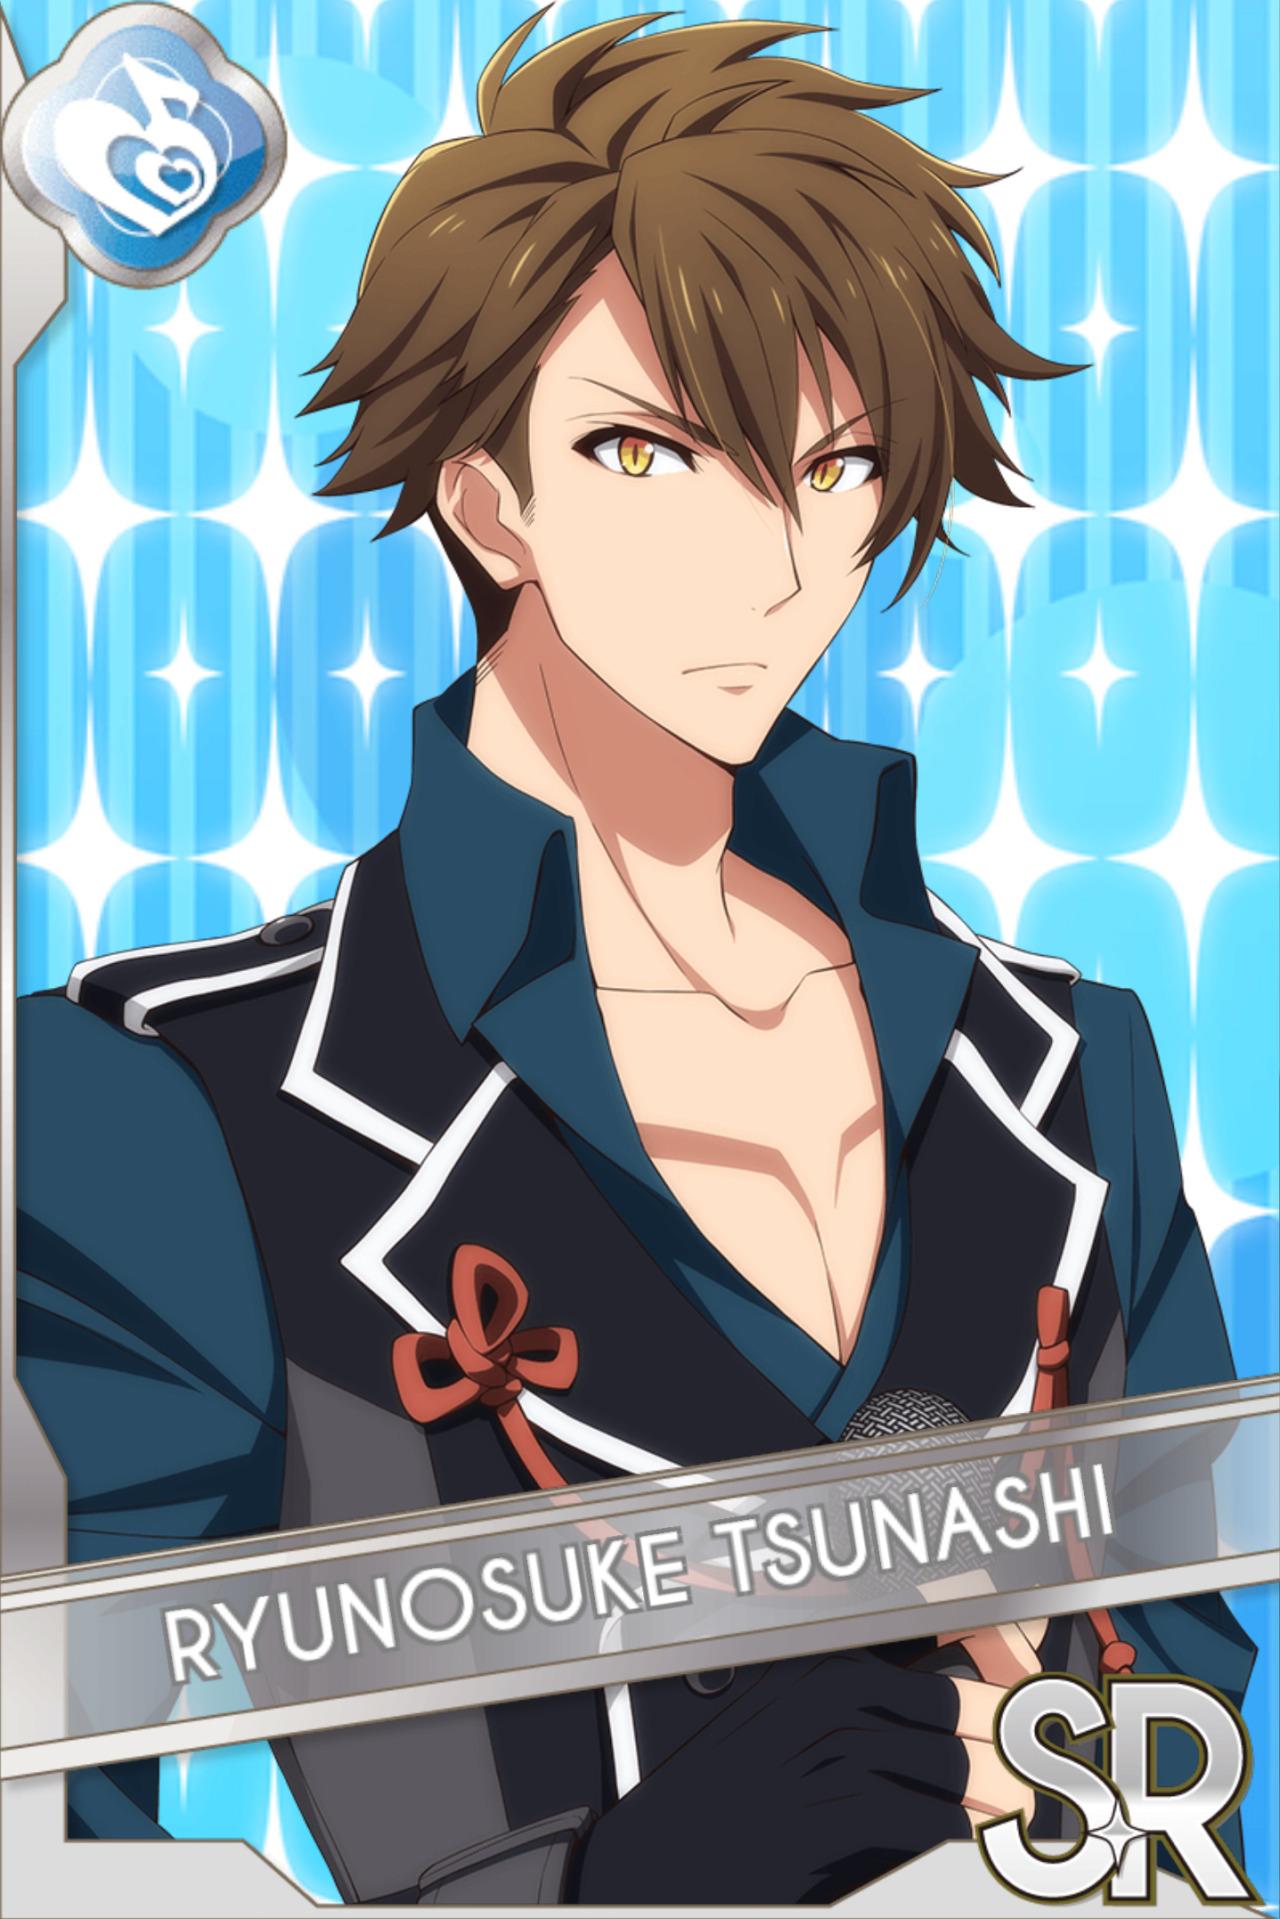 File:Ryunosuke Tsunashi (End-of-Year Live).png